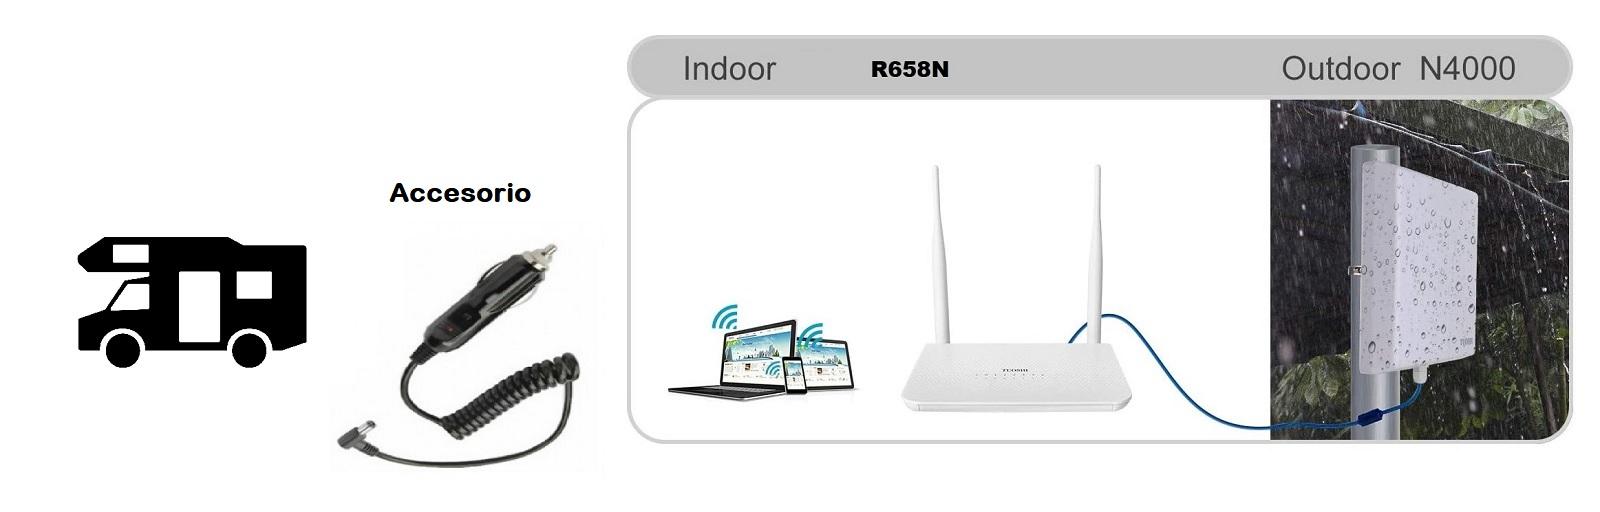 accessory 12v router